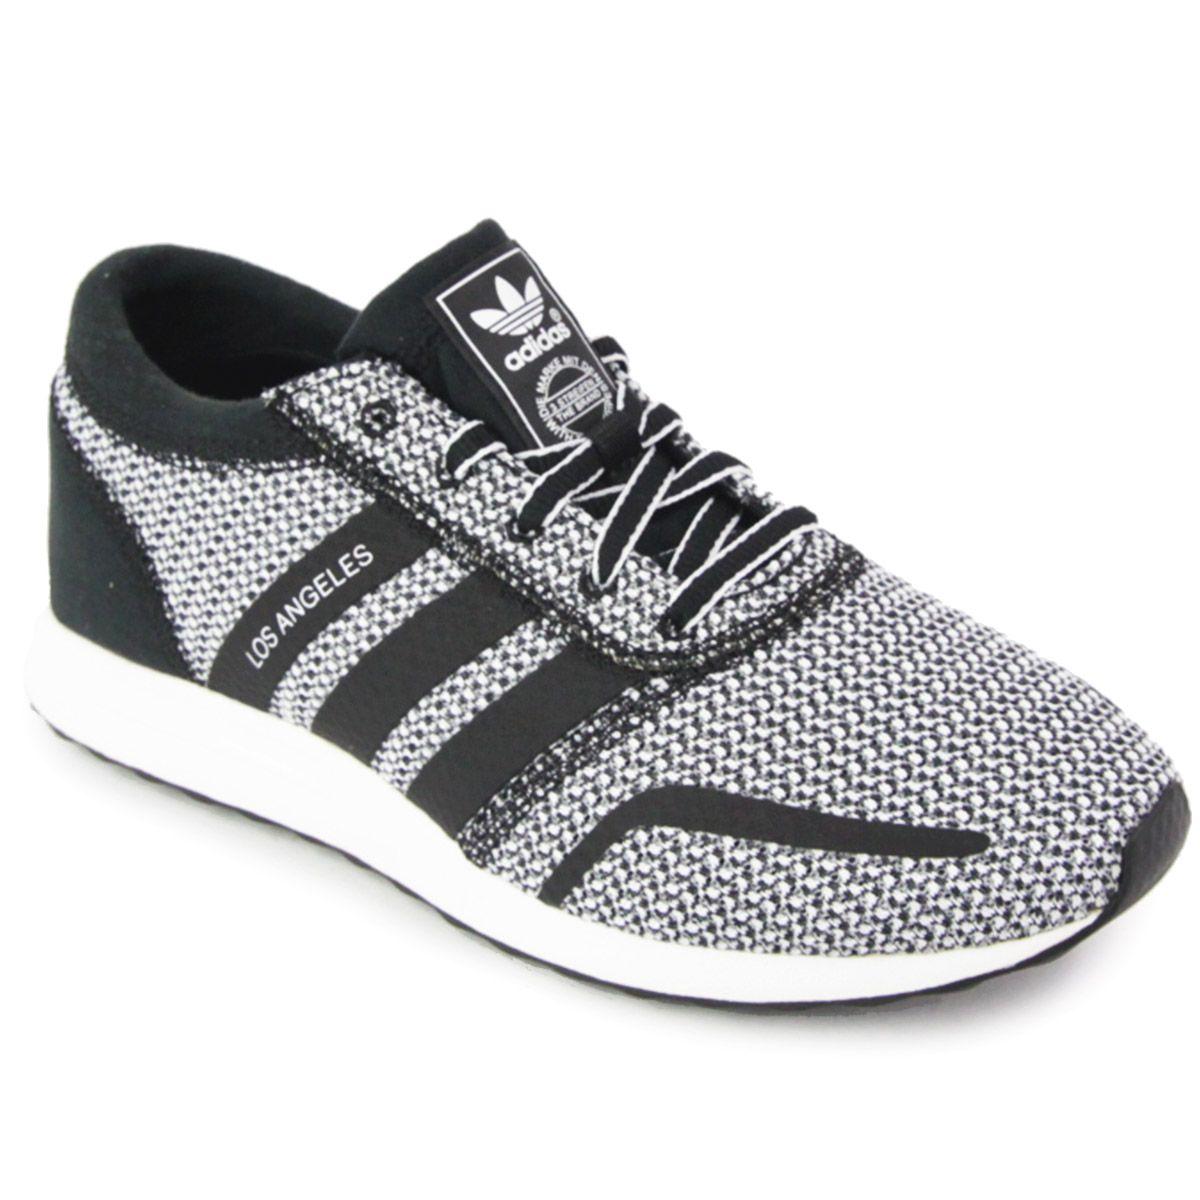 Buty sportowe Adidas Los Angeles S78917